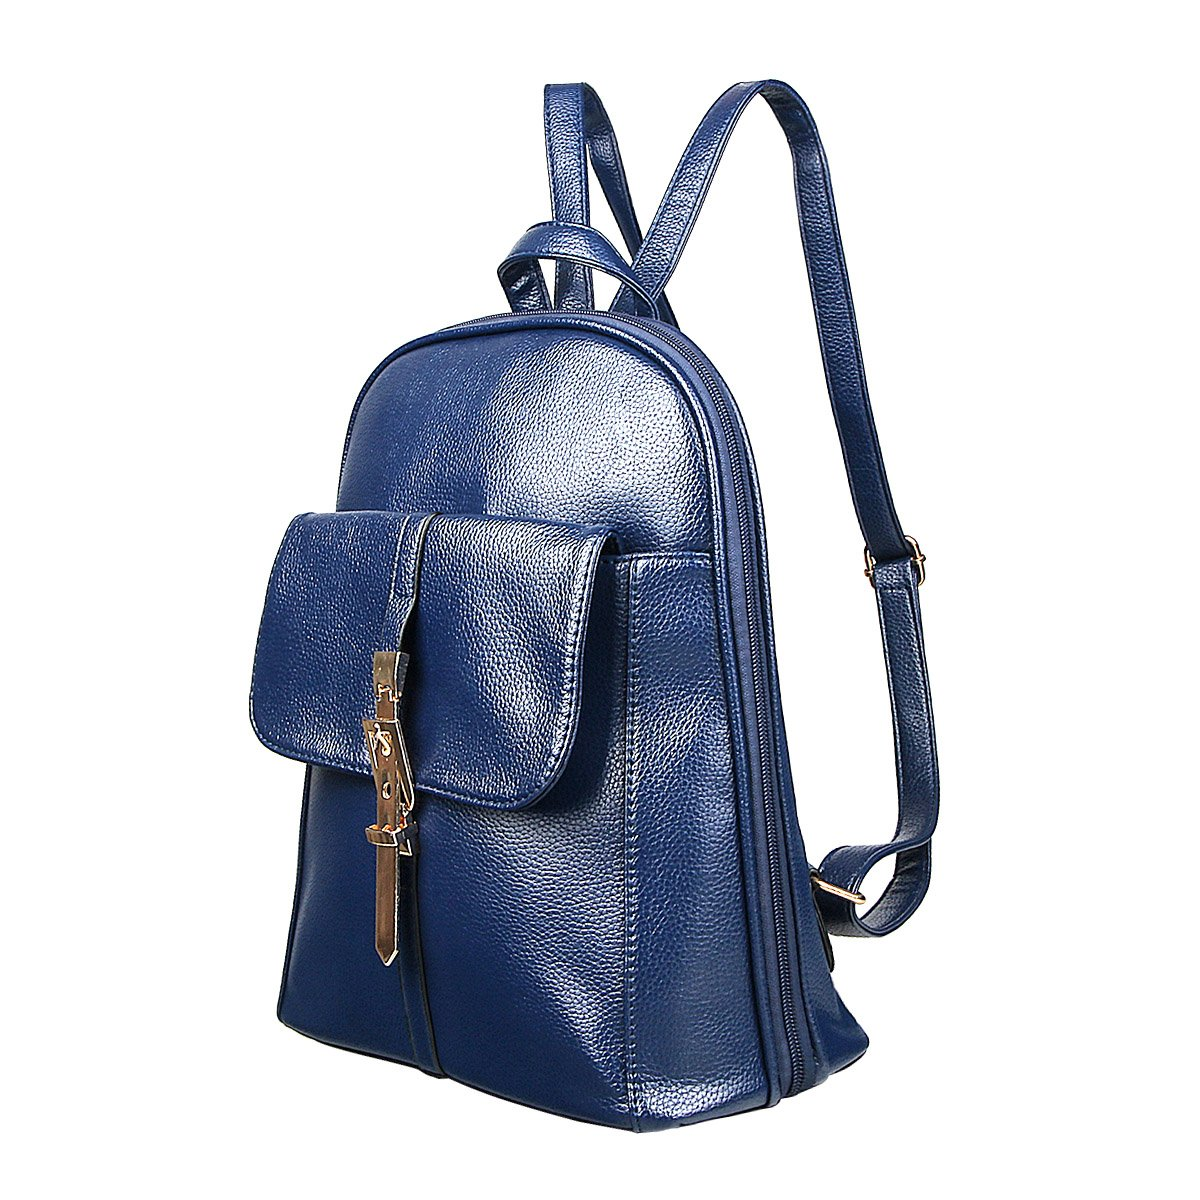 xhorizon TM FL1 Leather Mini School Bag Travel Backpack Rucksack Shoulder Bag Satchel (Navy) by xhorizon (Image #2)